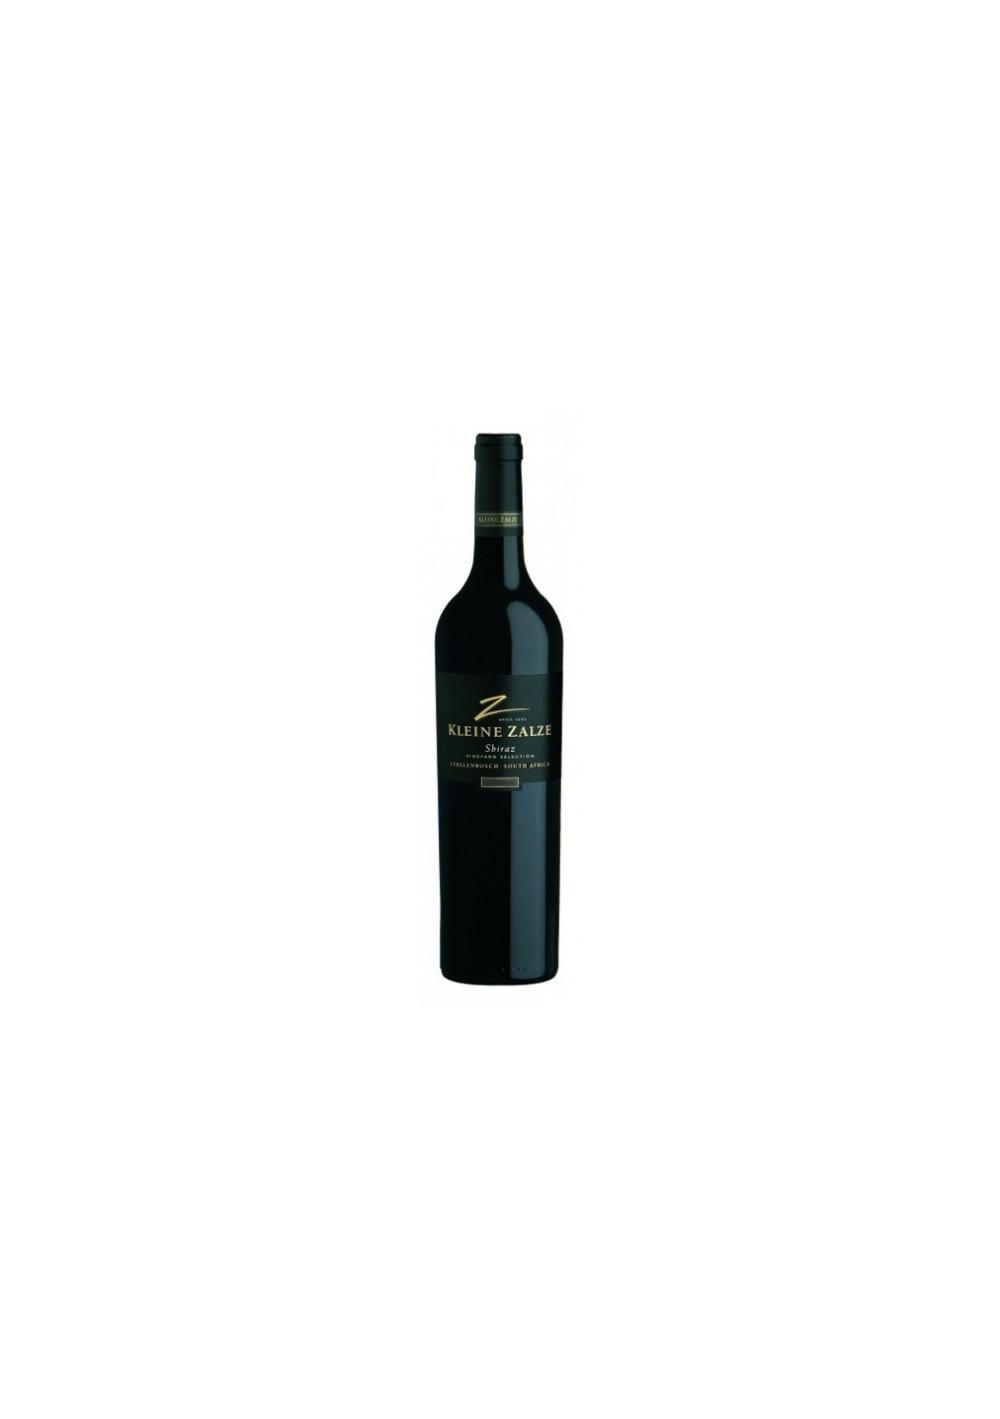 Vineyard Selection Shiraz Magnum 2016 Kleine Zalze Gepa